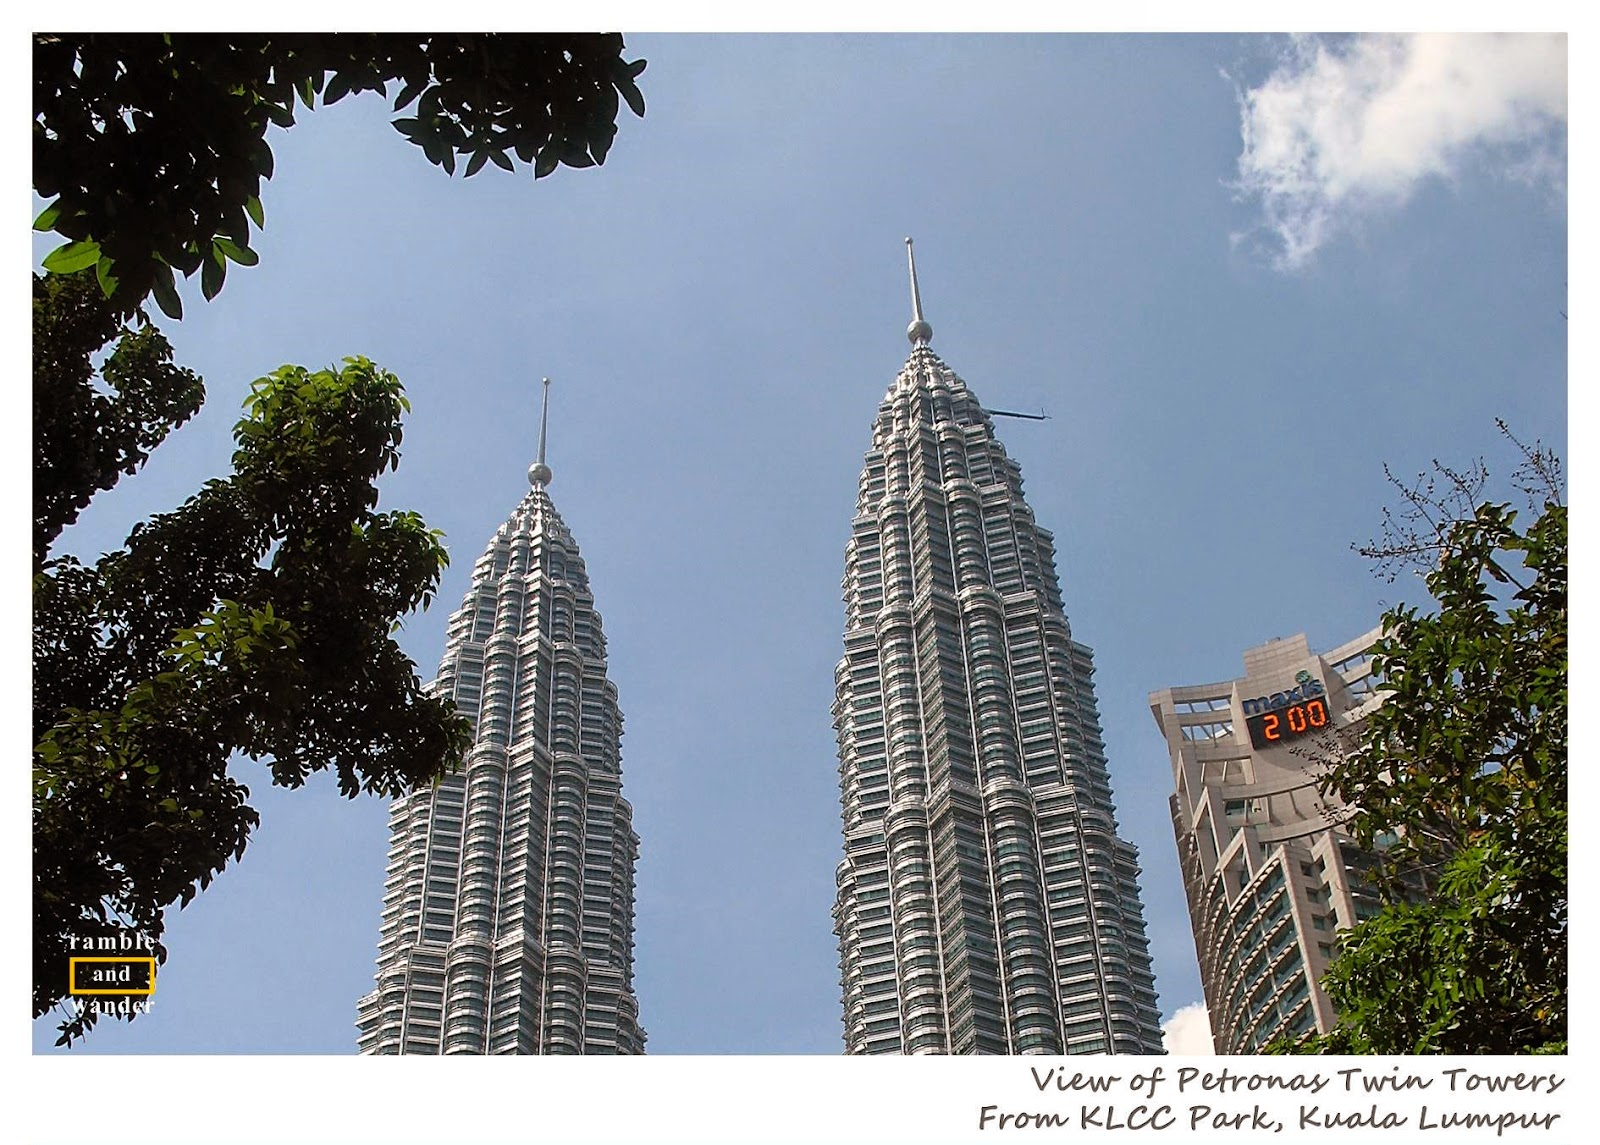 Malaysia: KLCC Lake Symphony Water Fountain Show